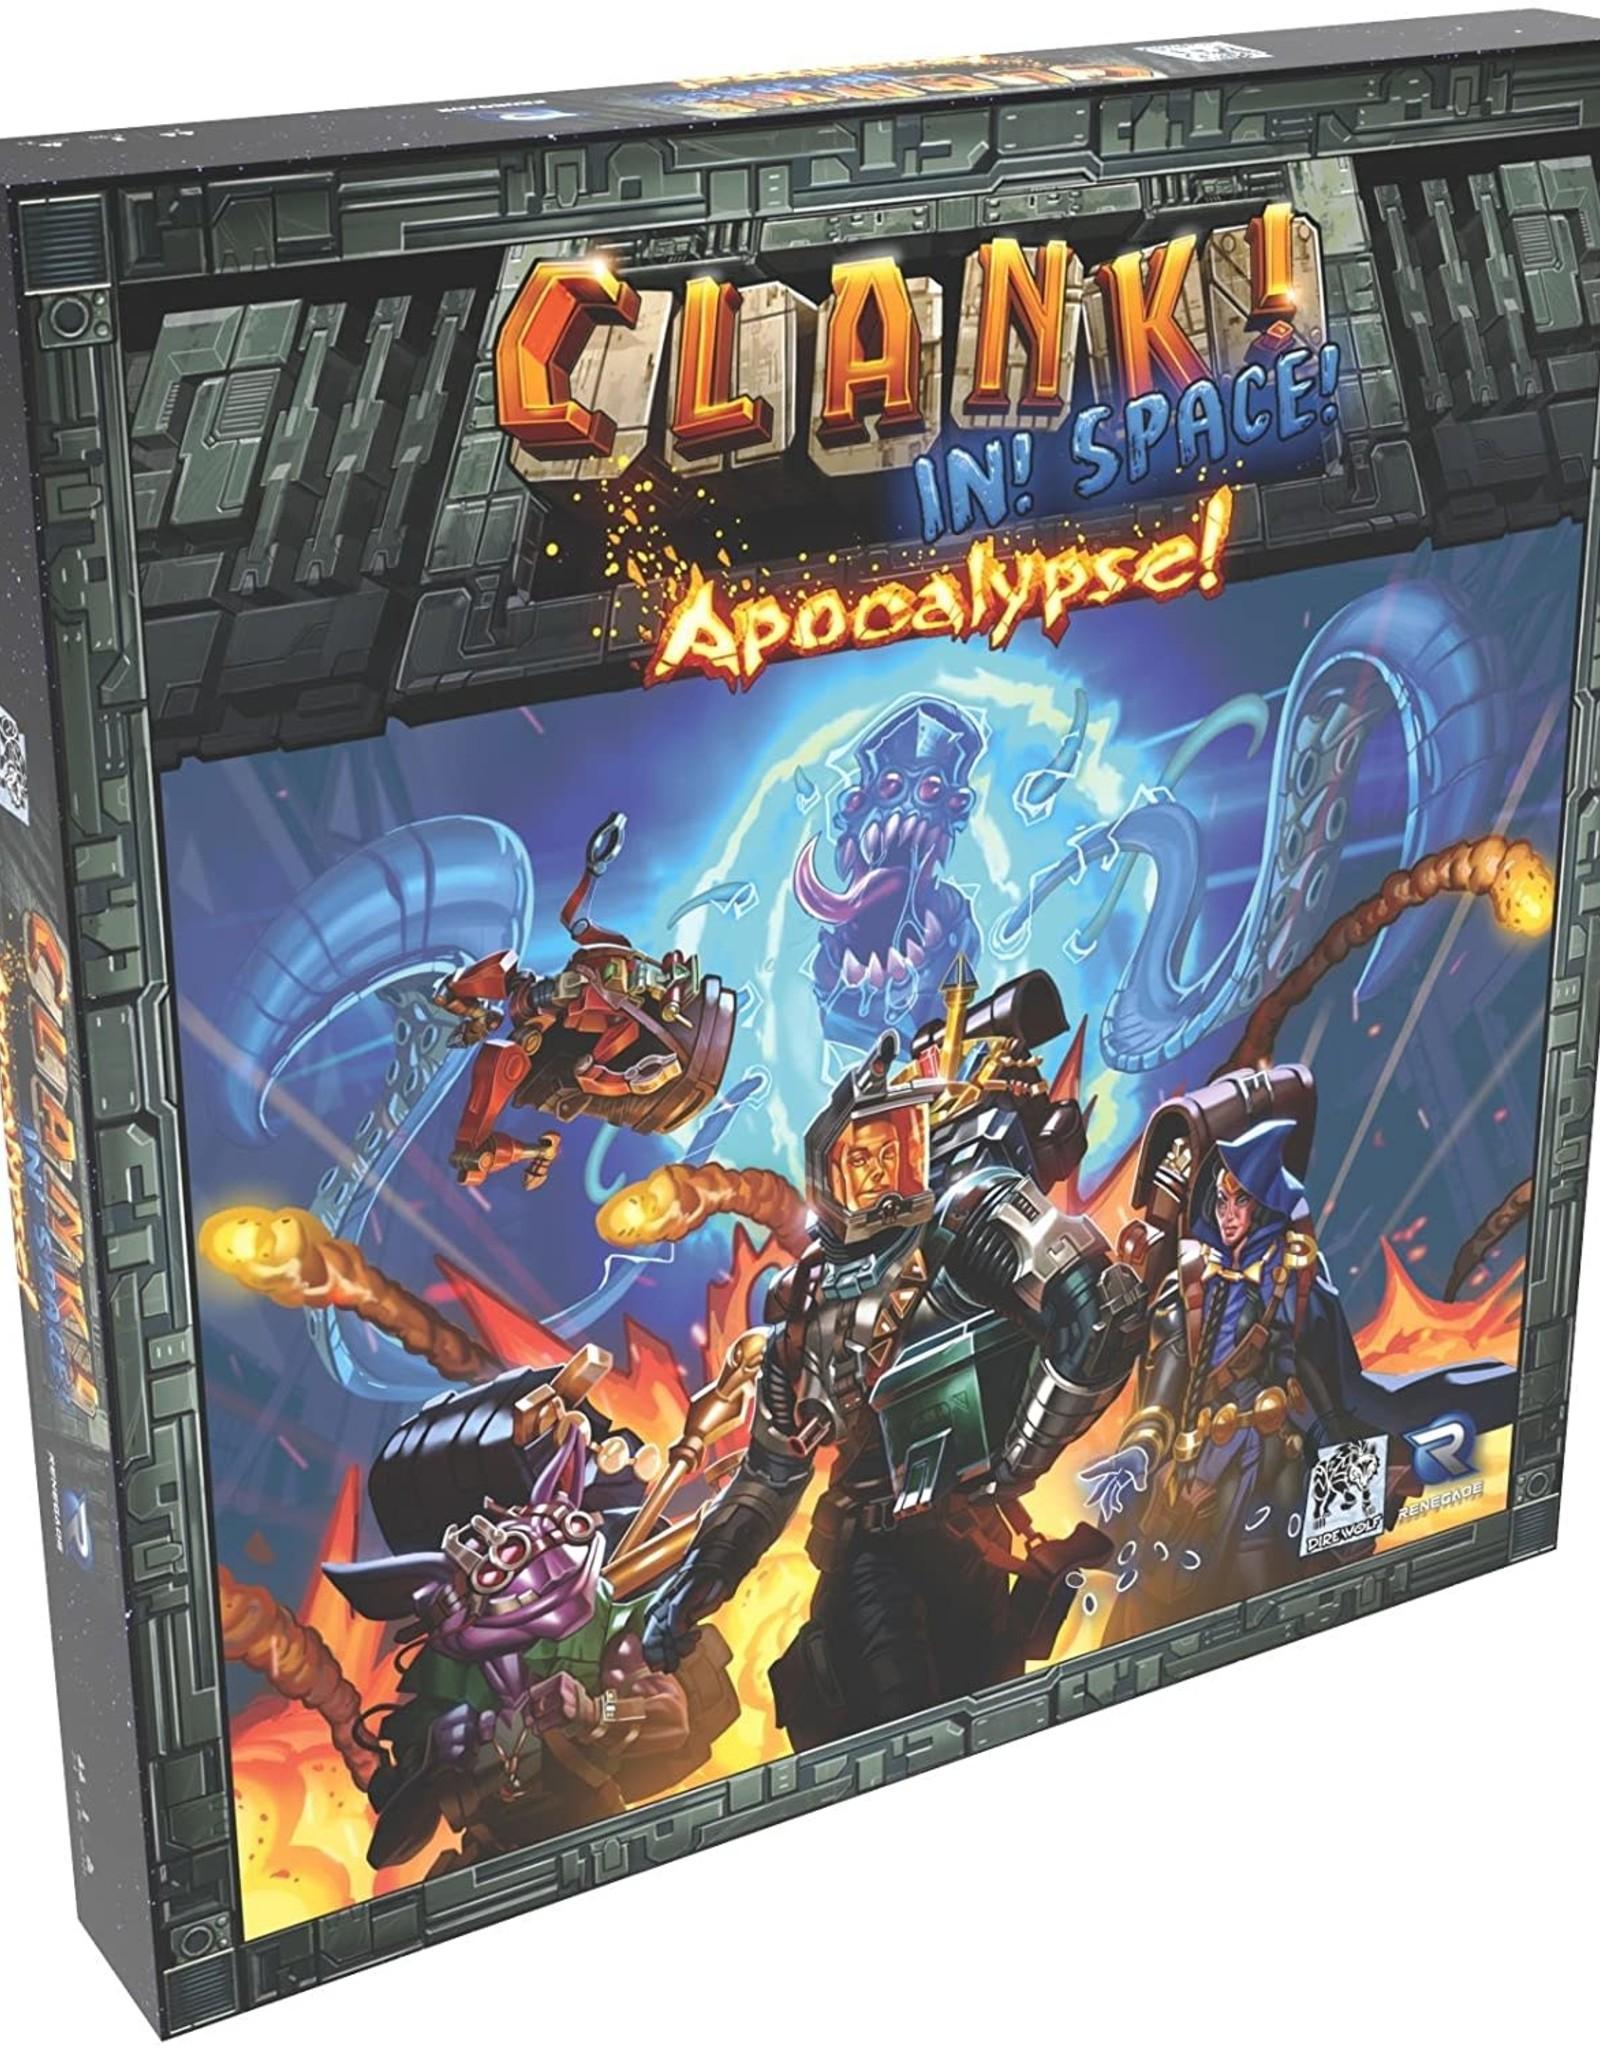 Renegade Game Studios Clank! In Space! Apocalypse